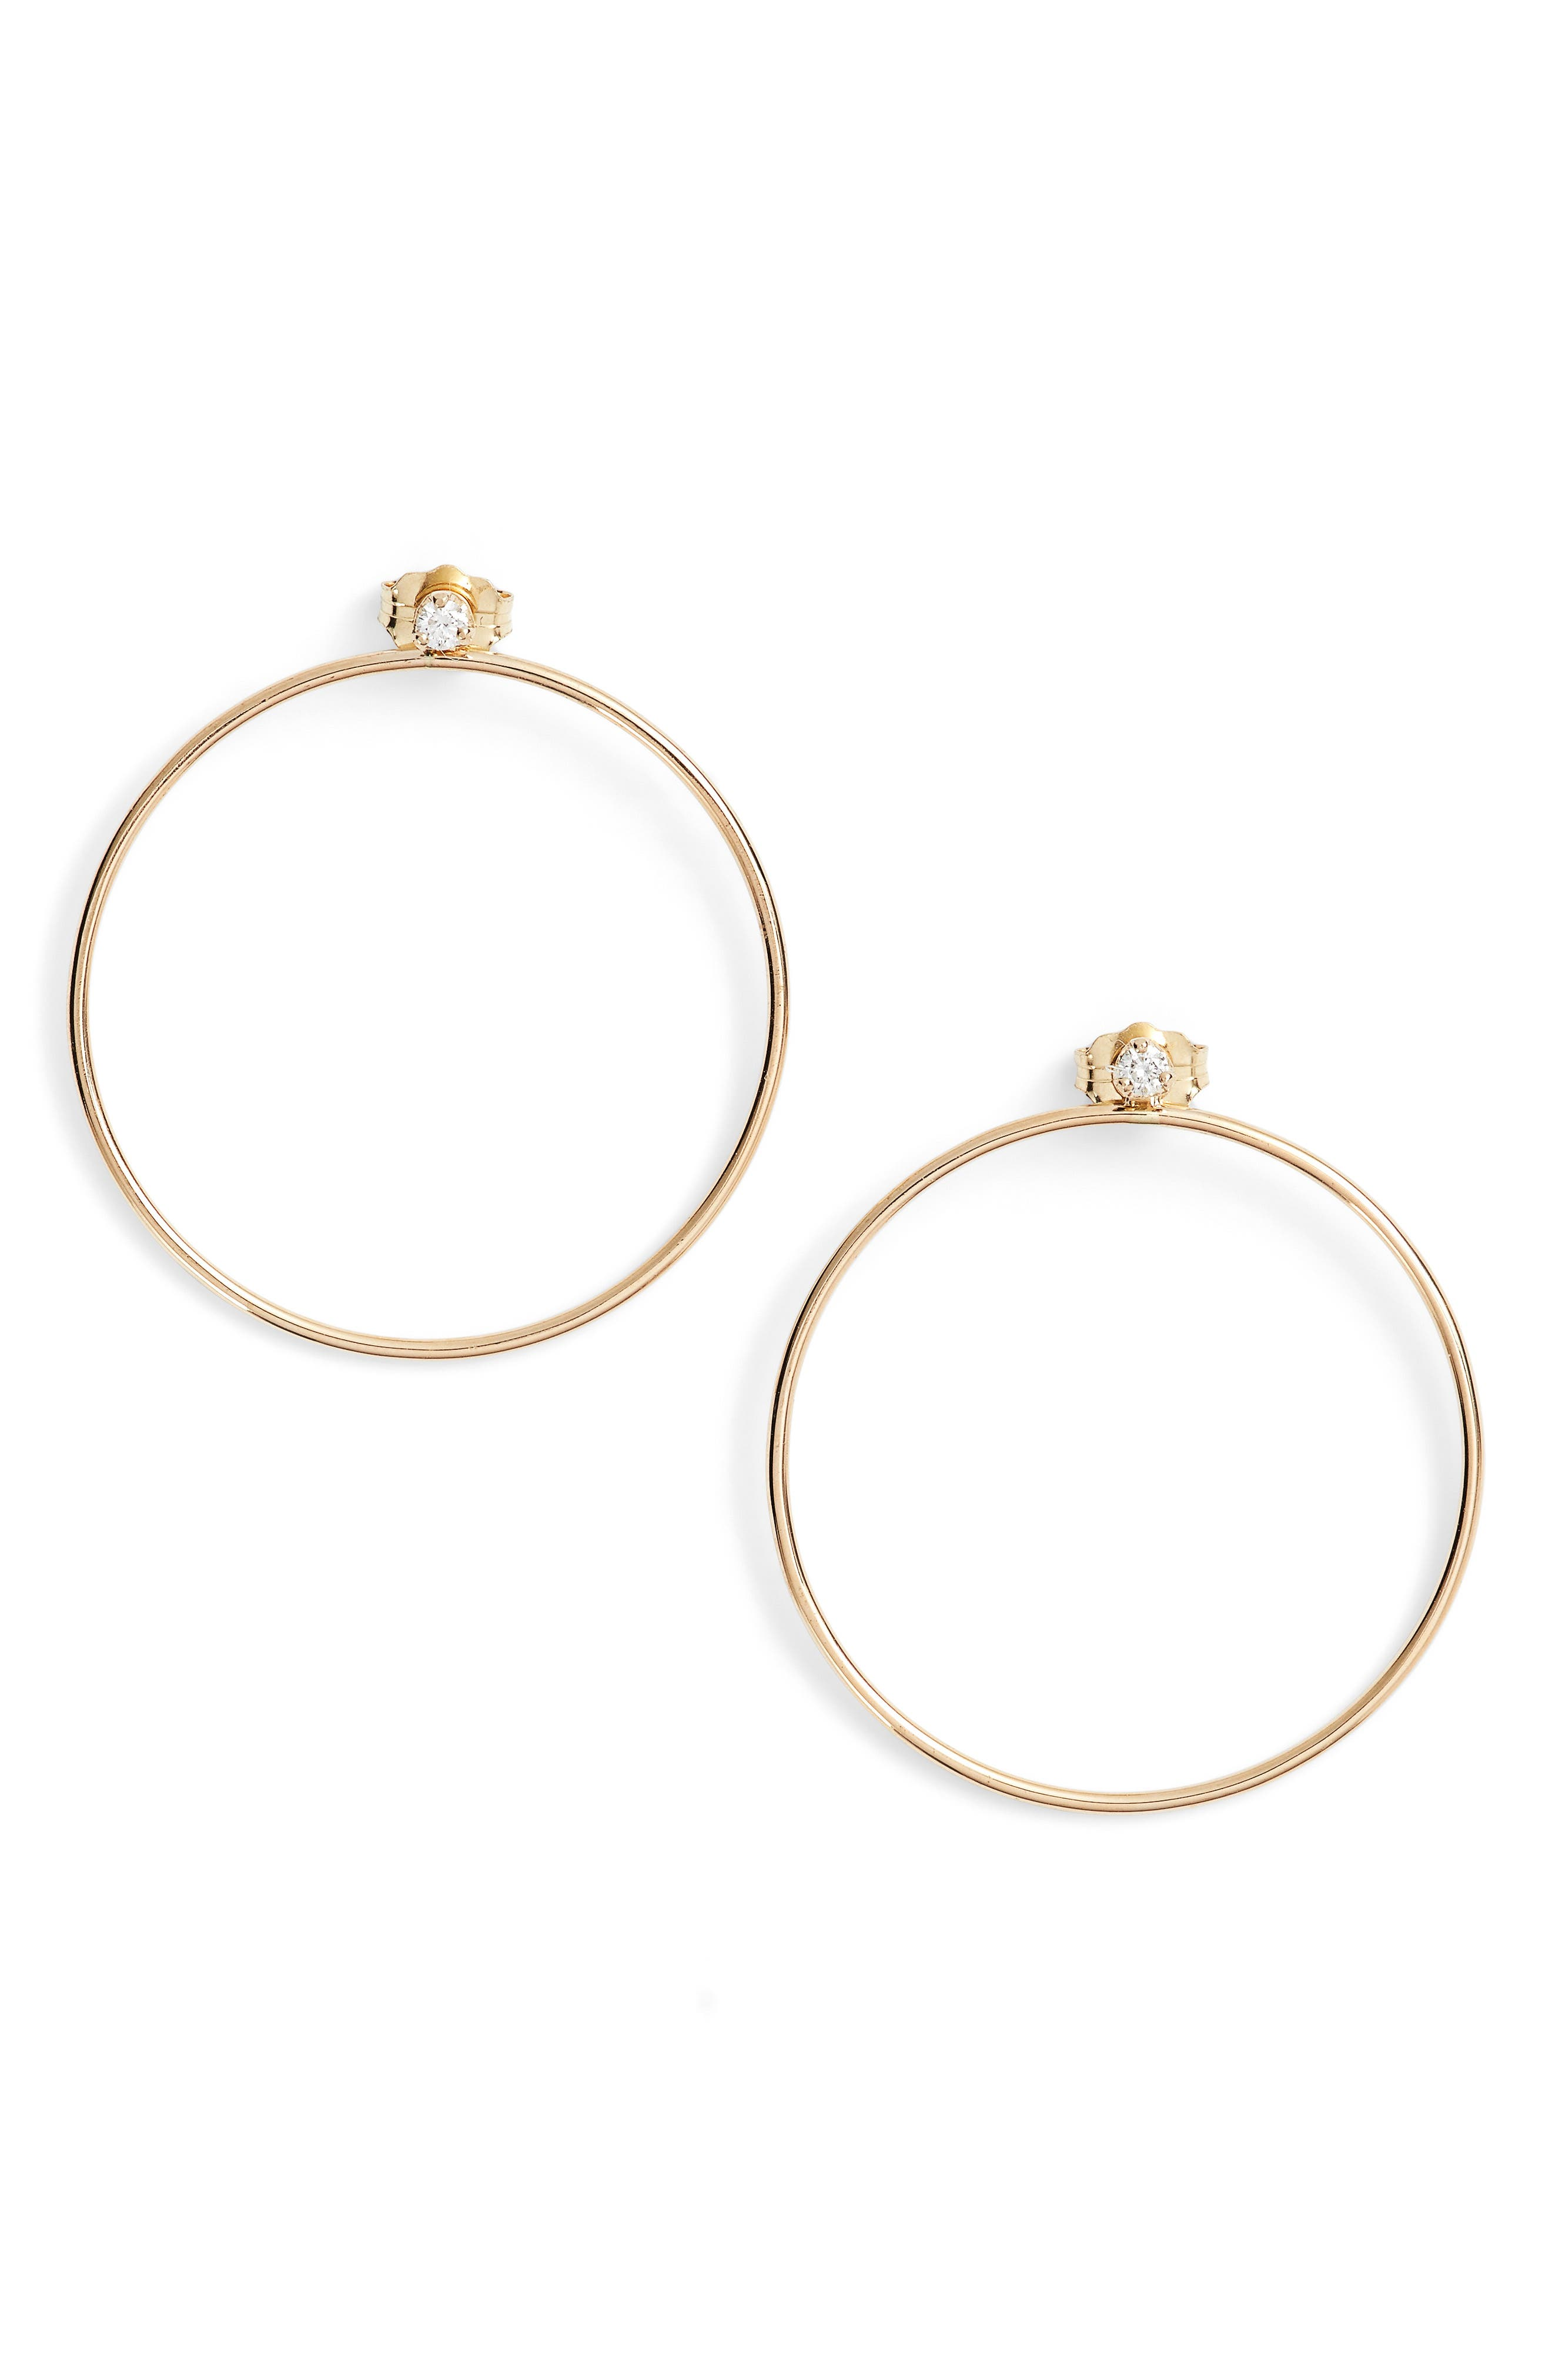 Main Image - Zoë Chicco Diamond Circle Ear Jackets